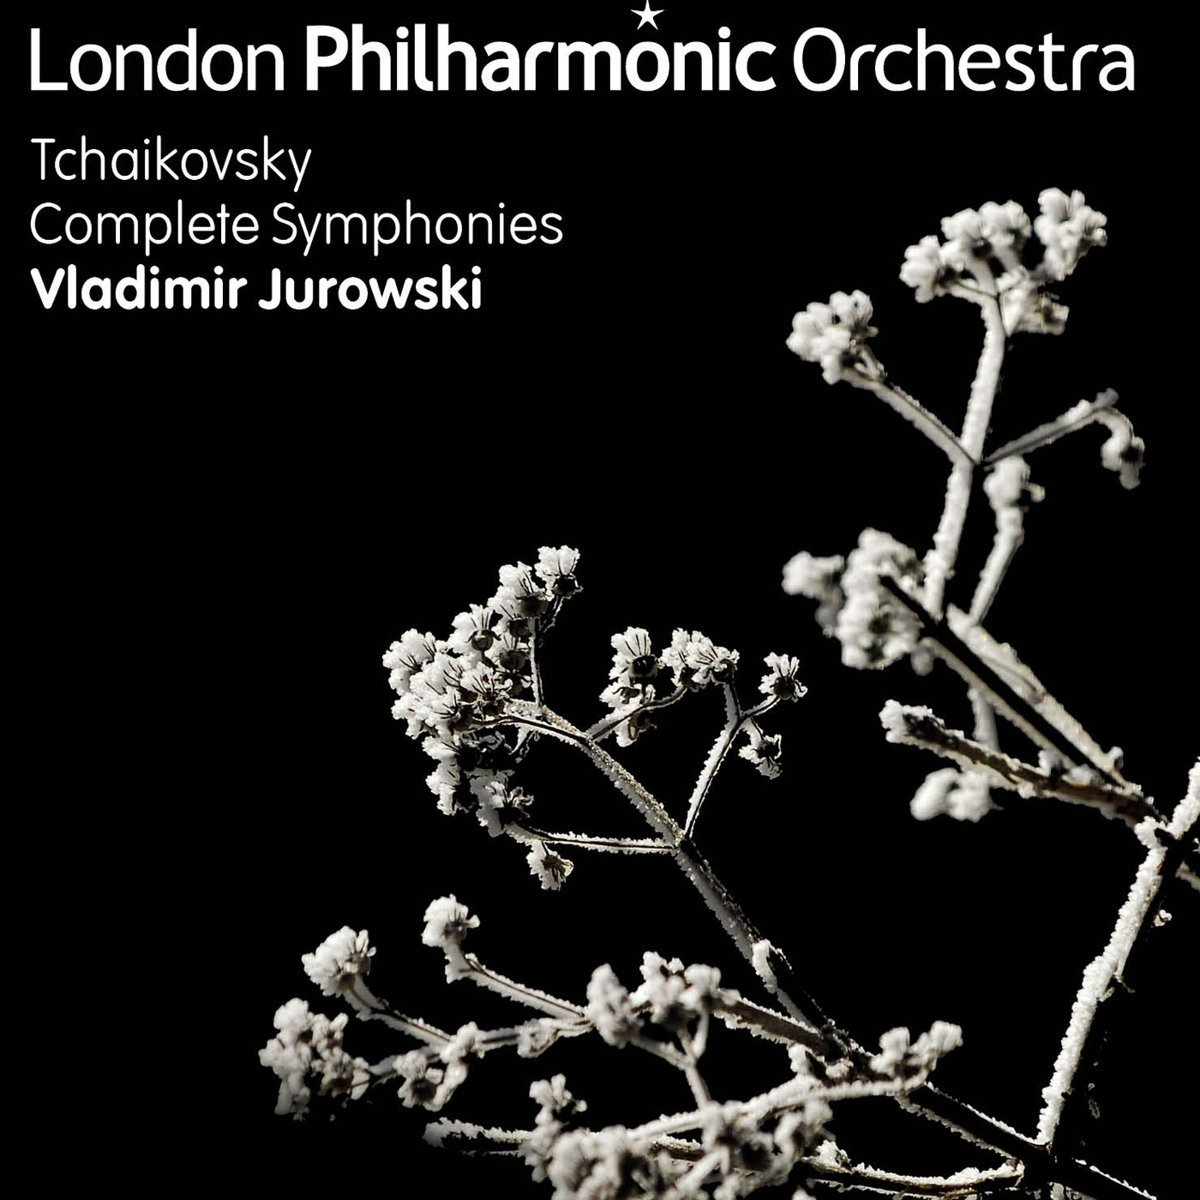 Tchaikovsky: London Philharmonic